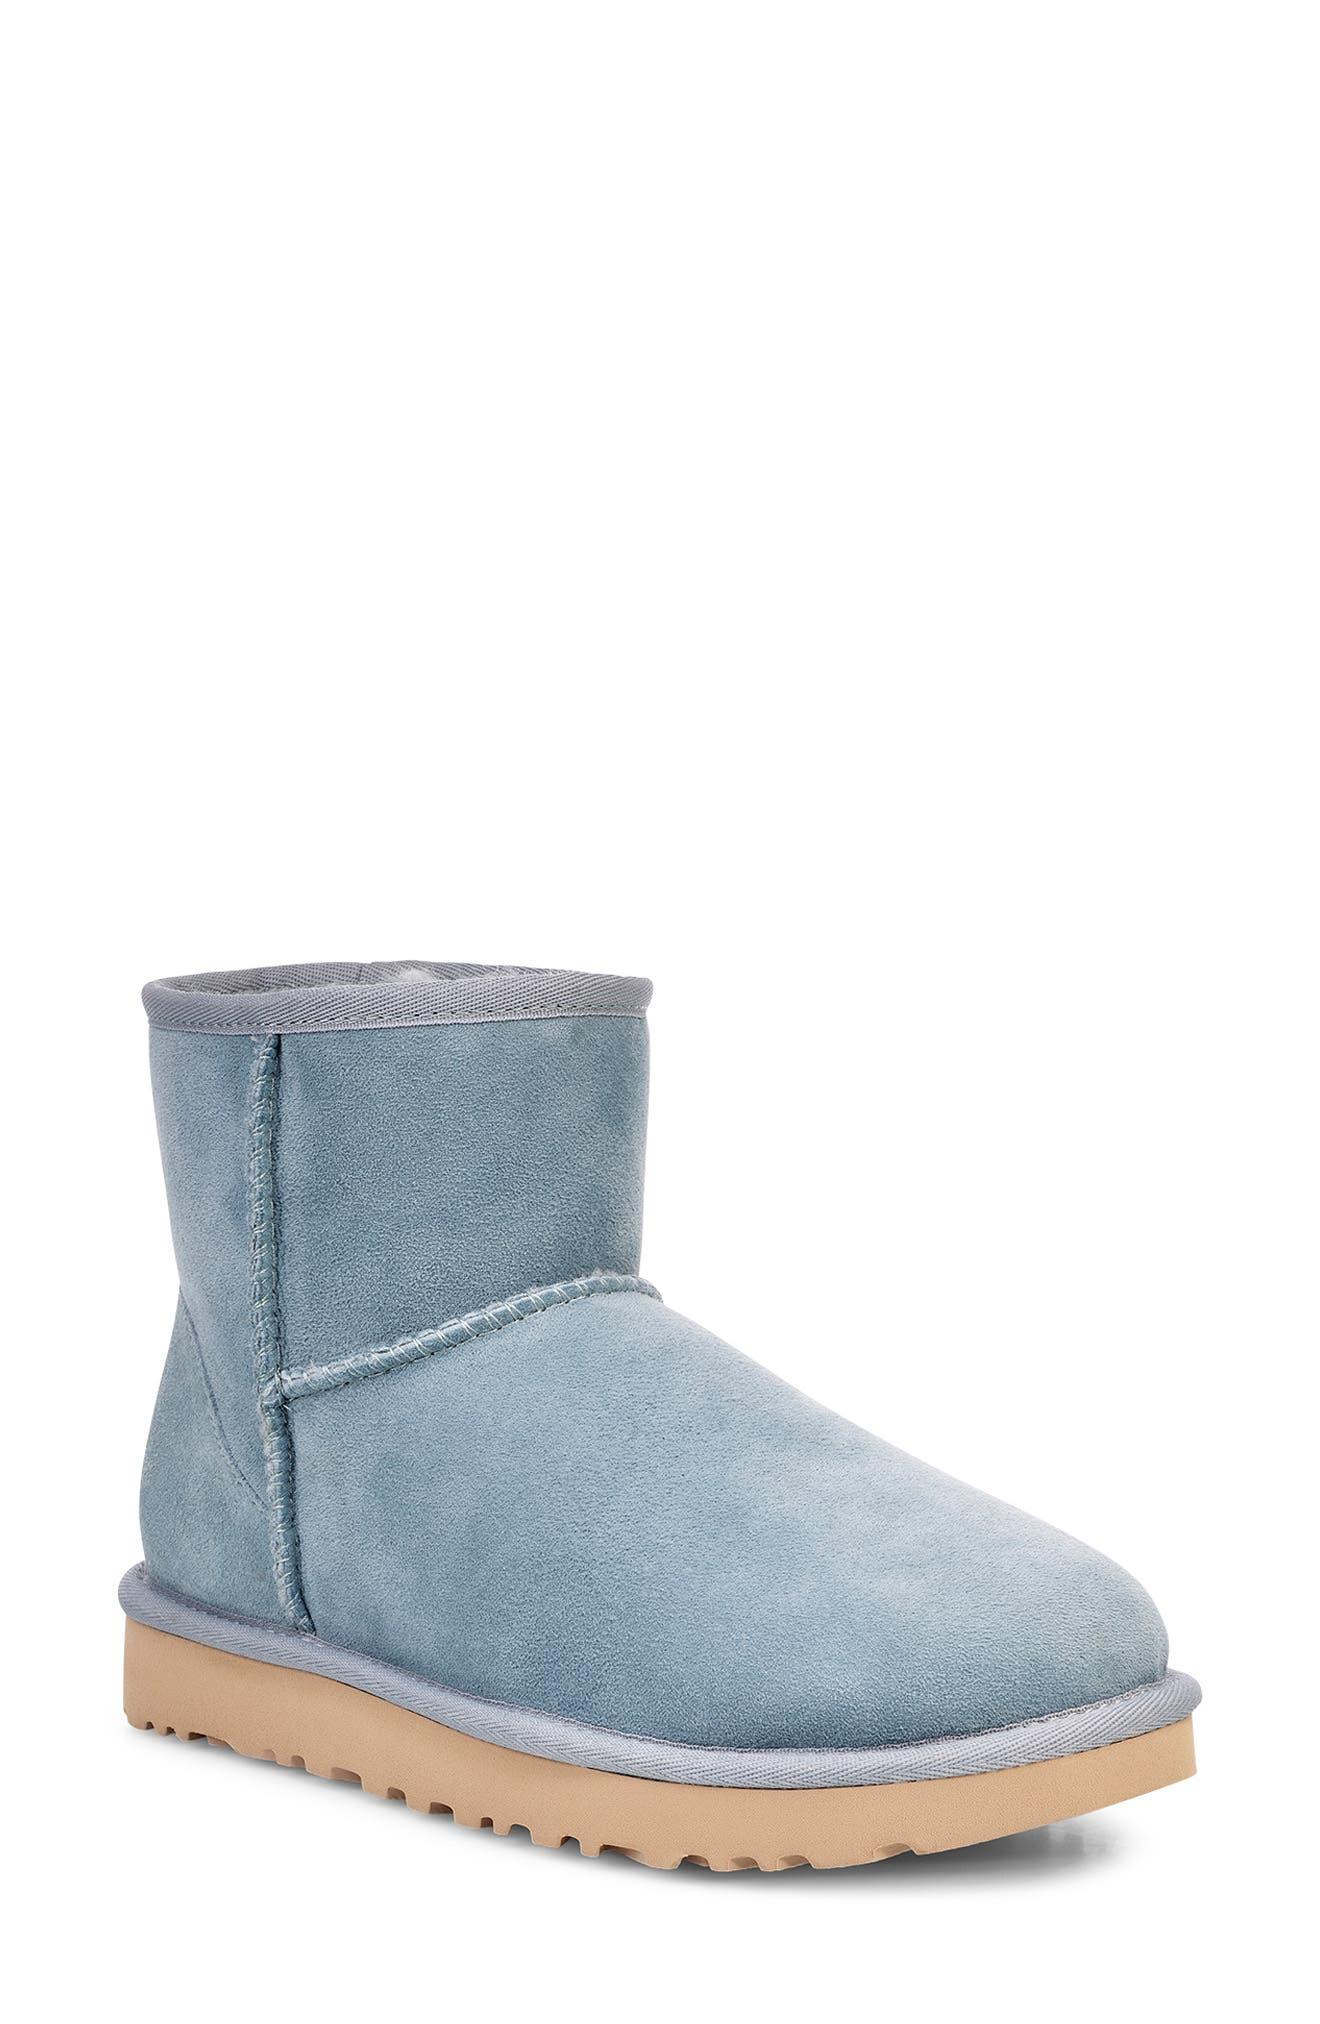 ugg classic mini ii genuine shearling lined boot women nordstrom rh shop nordstrom com